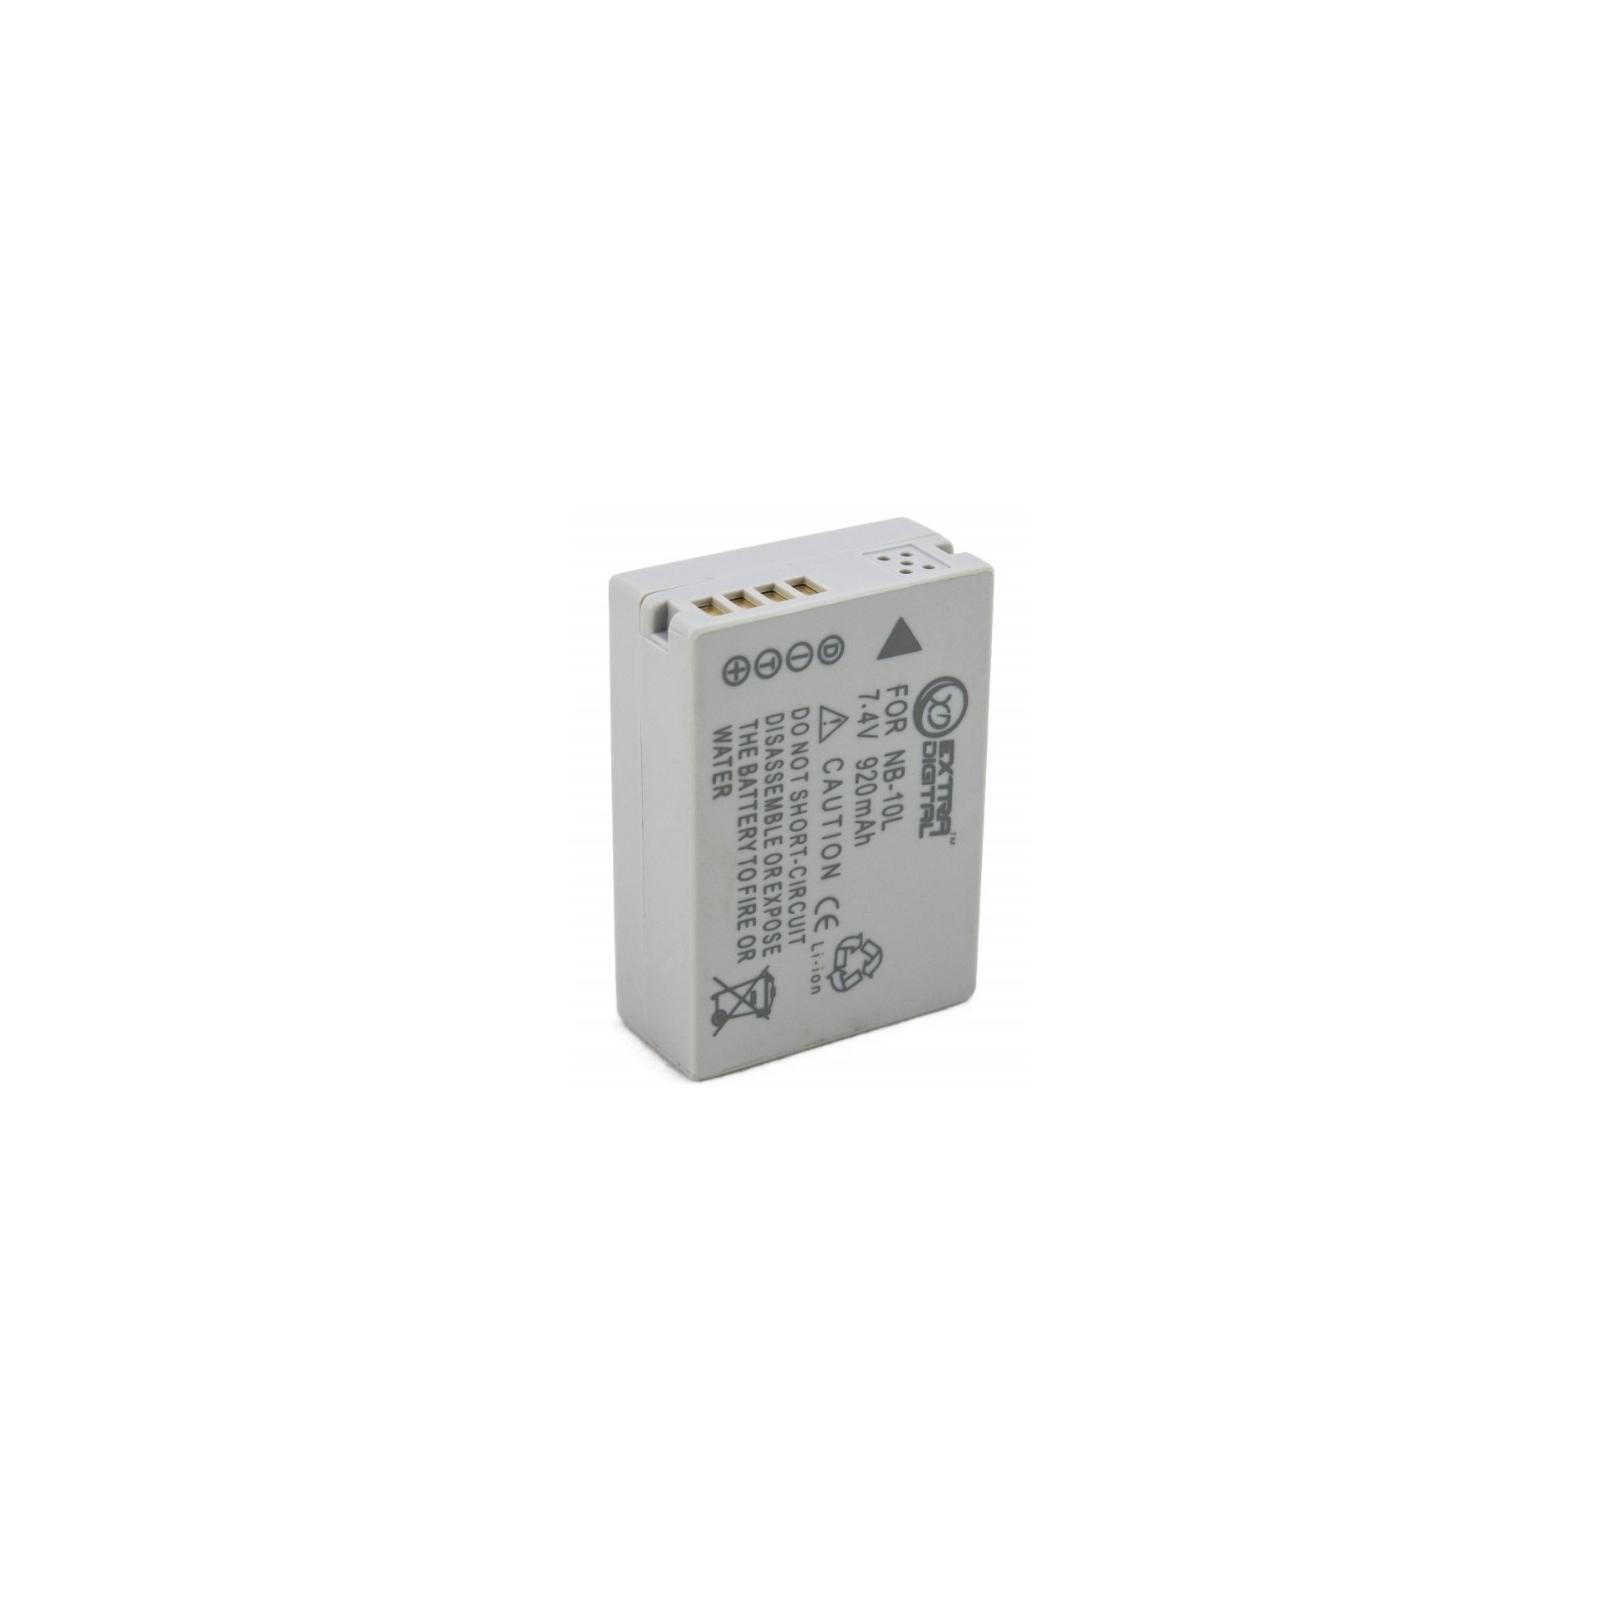 Аккумулятор к фото/видео EXTRADIGITAL Canon LP-E5 (BDC2430) изображение 2